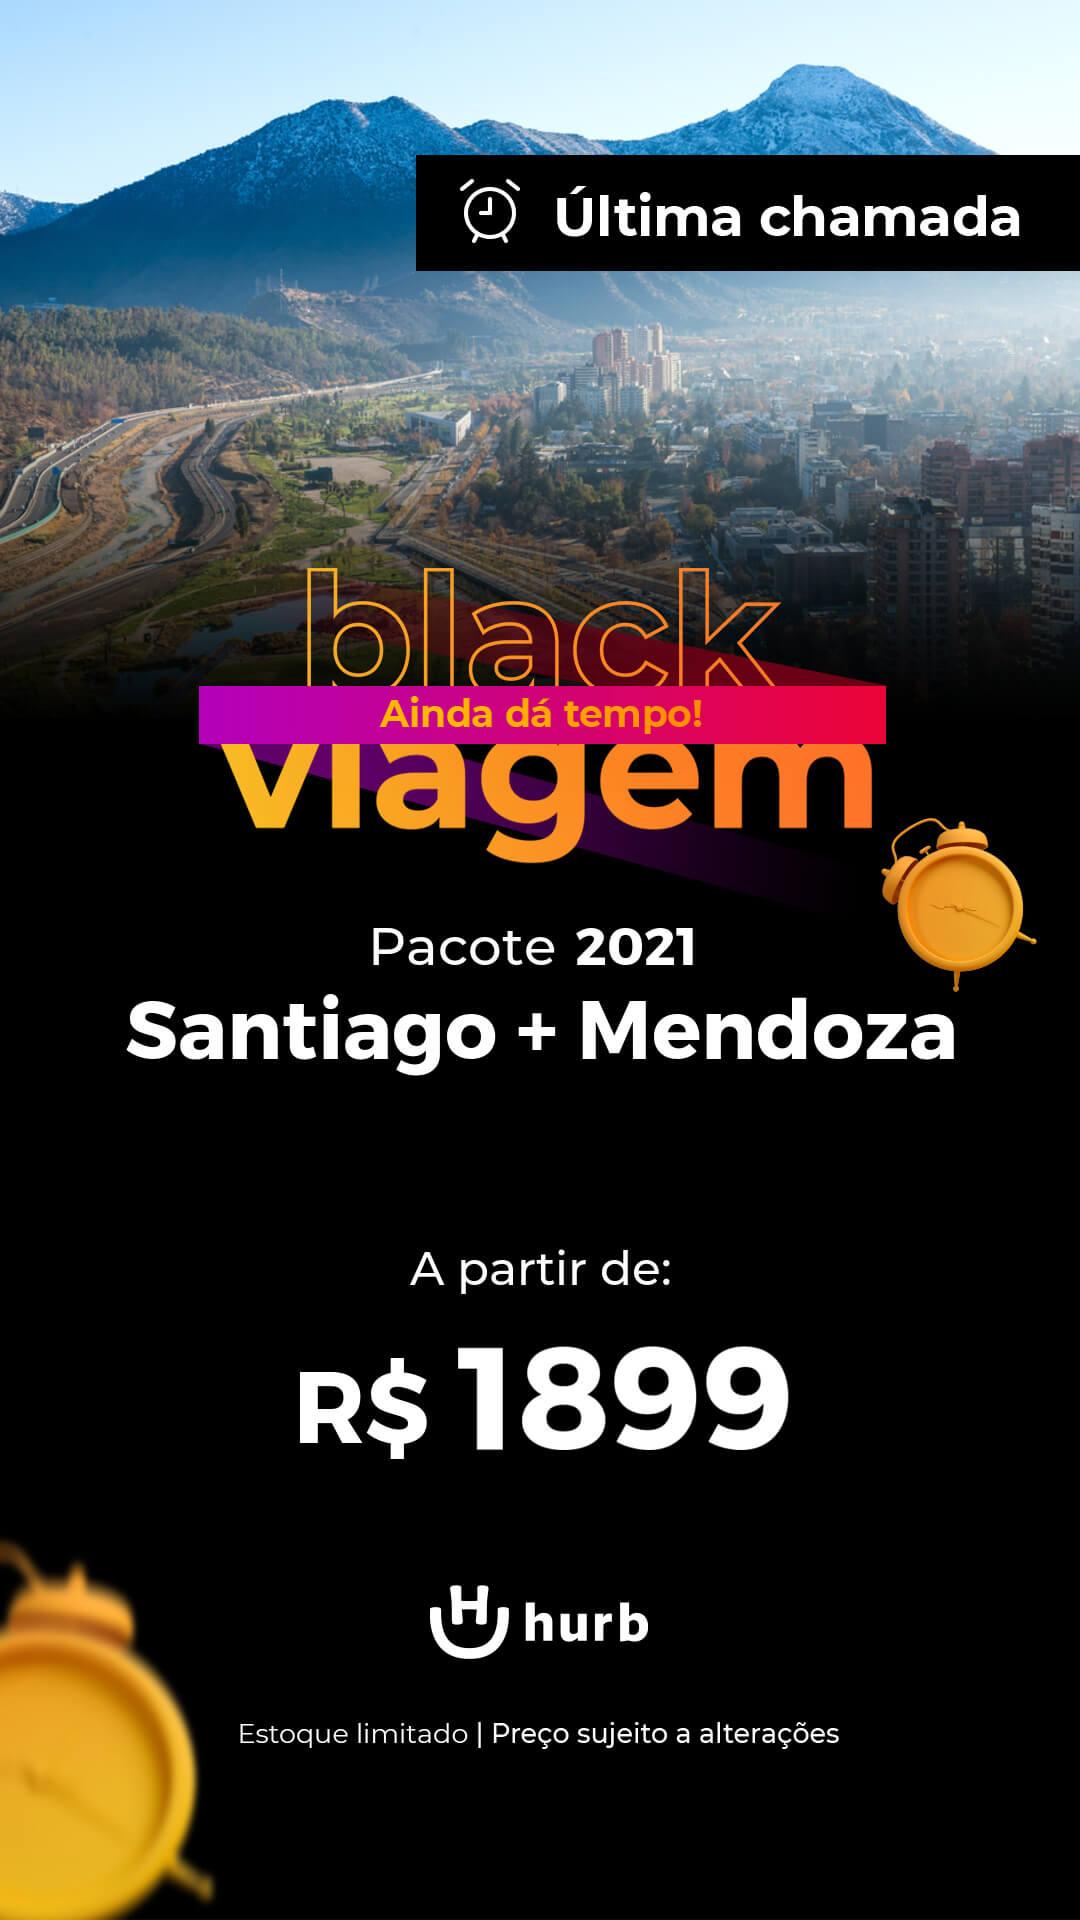 pacote santiago mendoza segundo semestre 2021